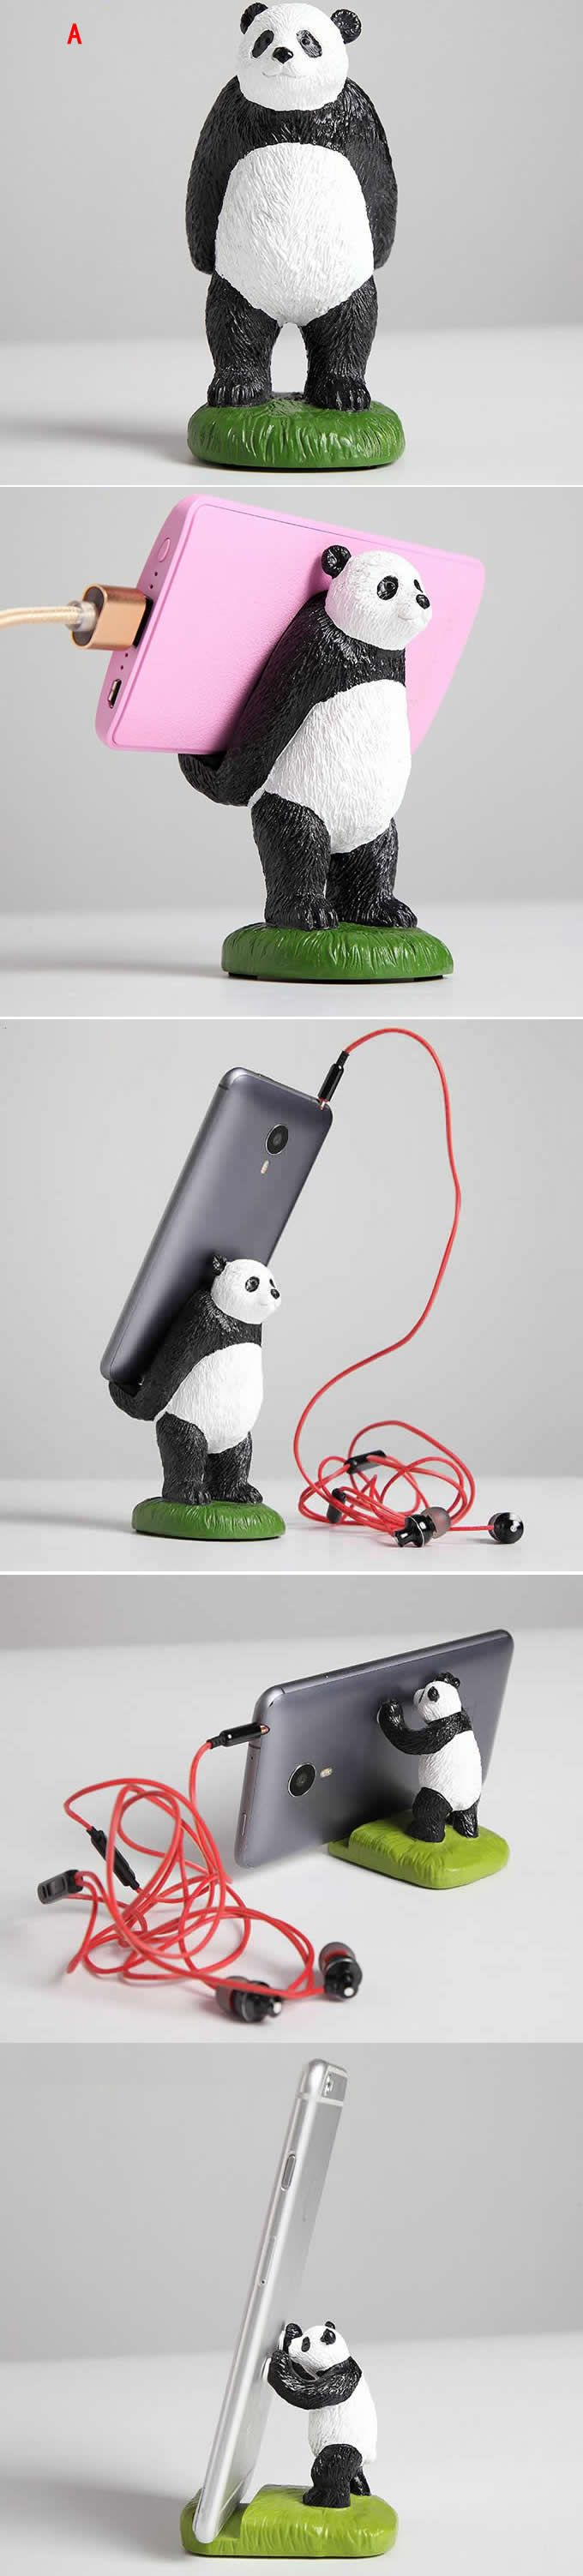 Panda Figurine Mobile Phone Holder Stand